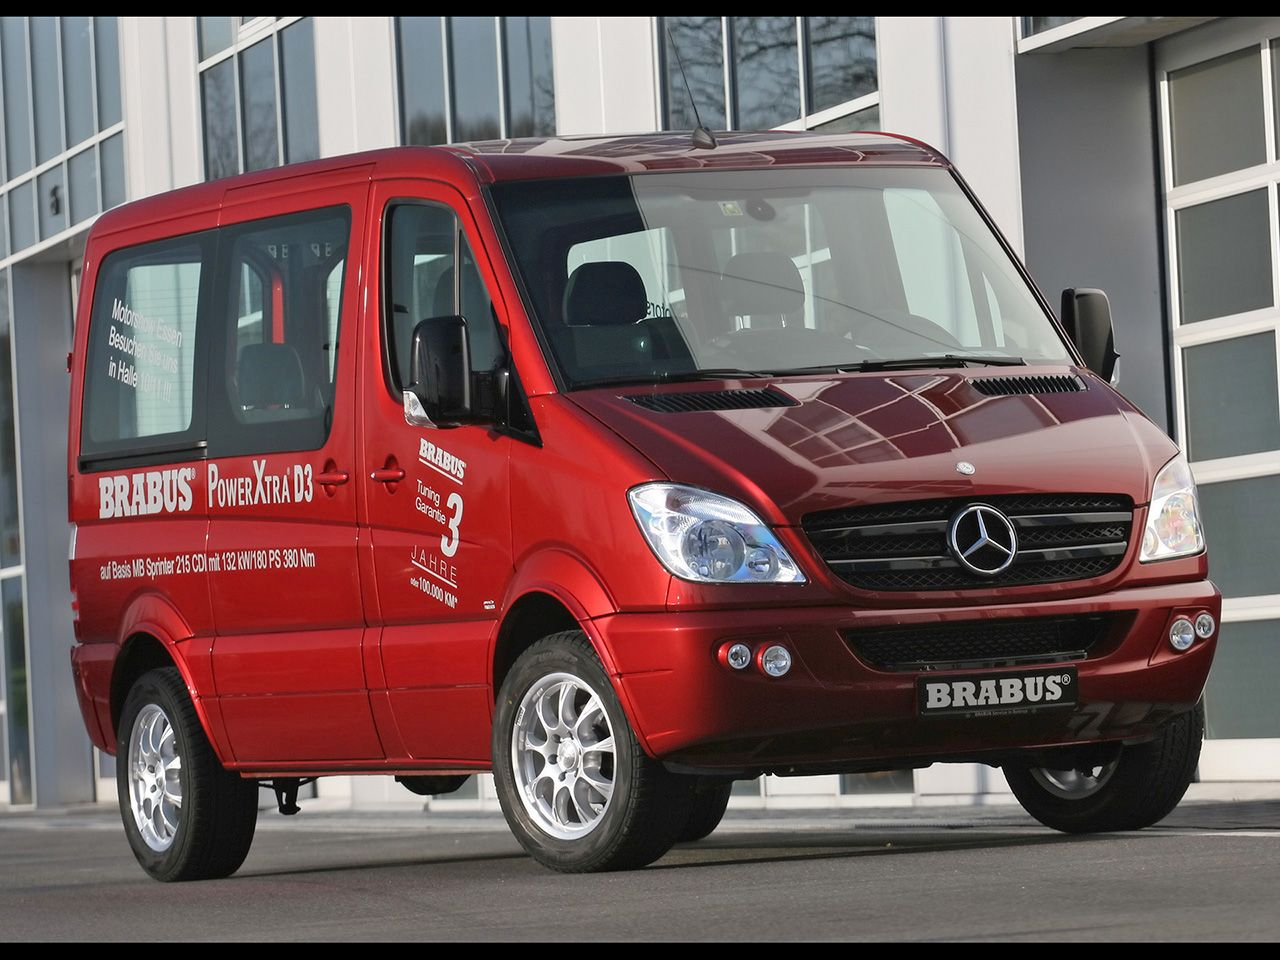 Mercedes benz sprinter 315 cdi mercedes benz pinterest benz sprinter mercedes benz and car photos